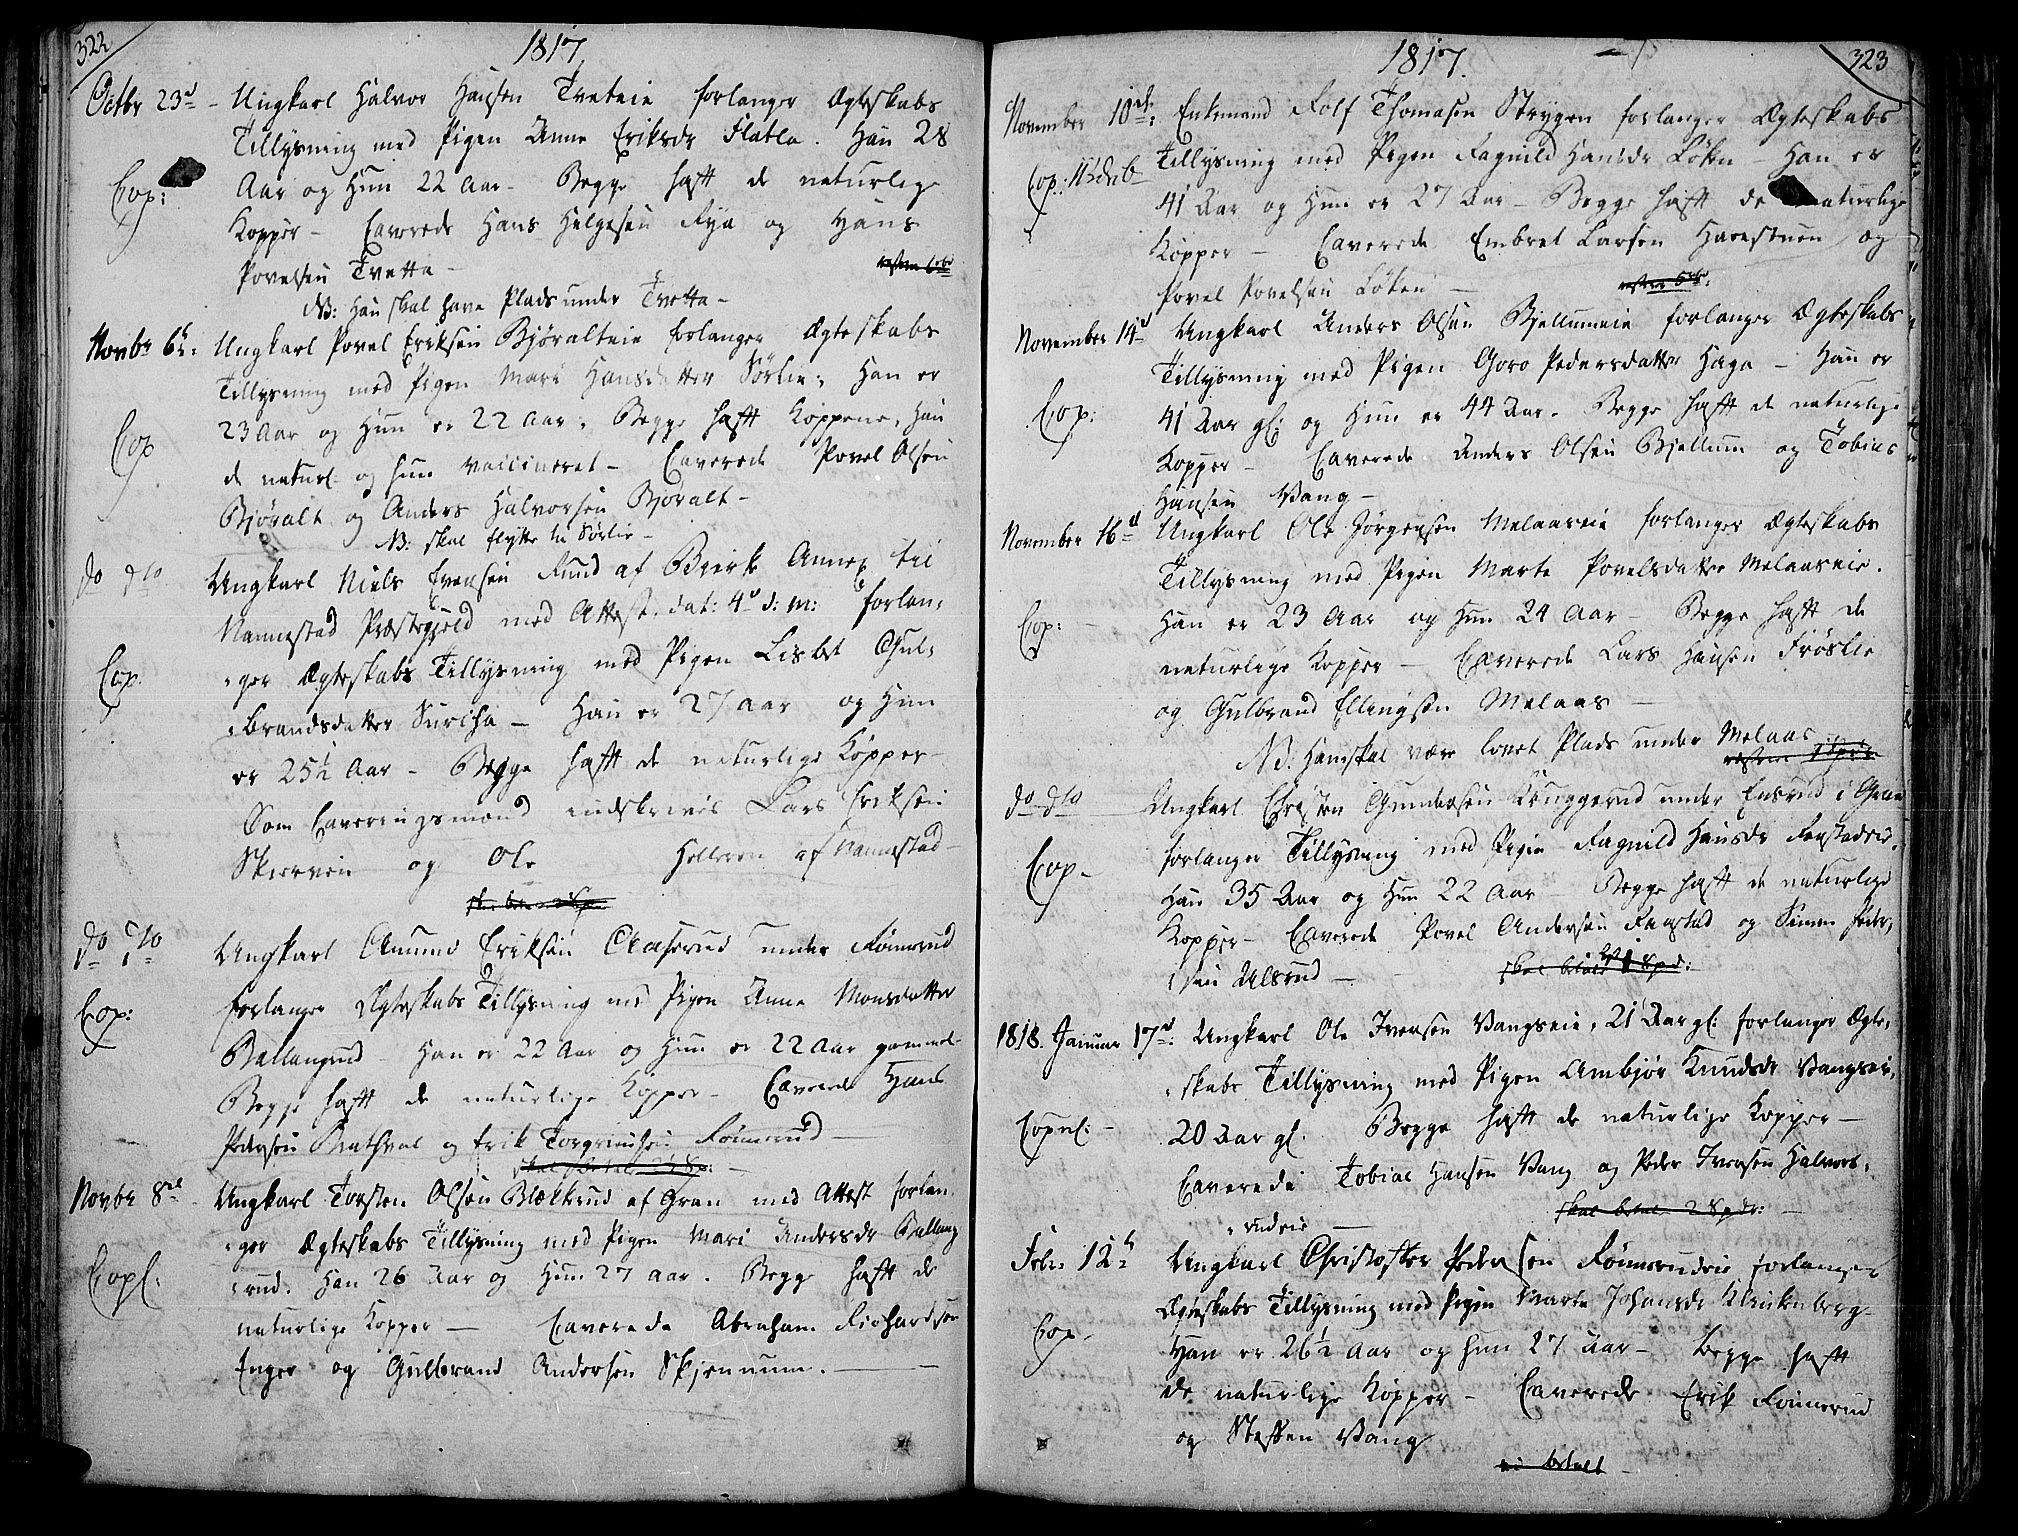 SAH, Jevnaker prestekontor, Ministerialbok nr. 4, 1800-1861, s. 322-323